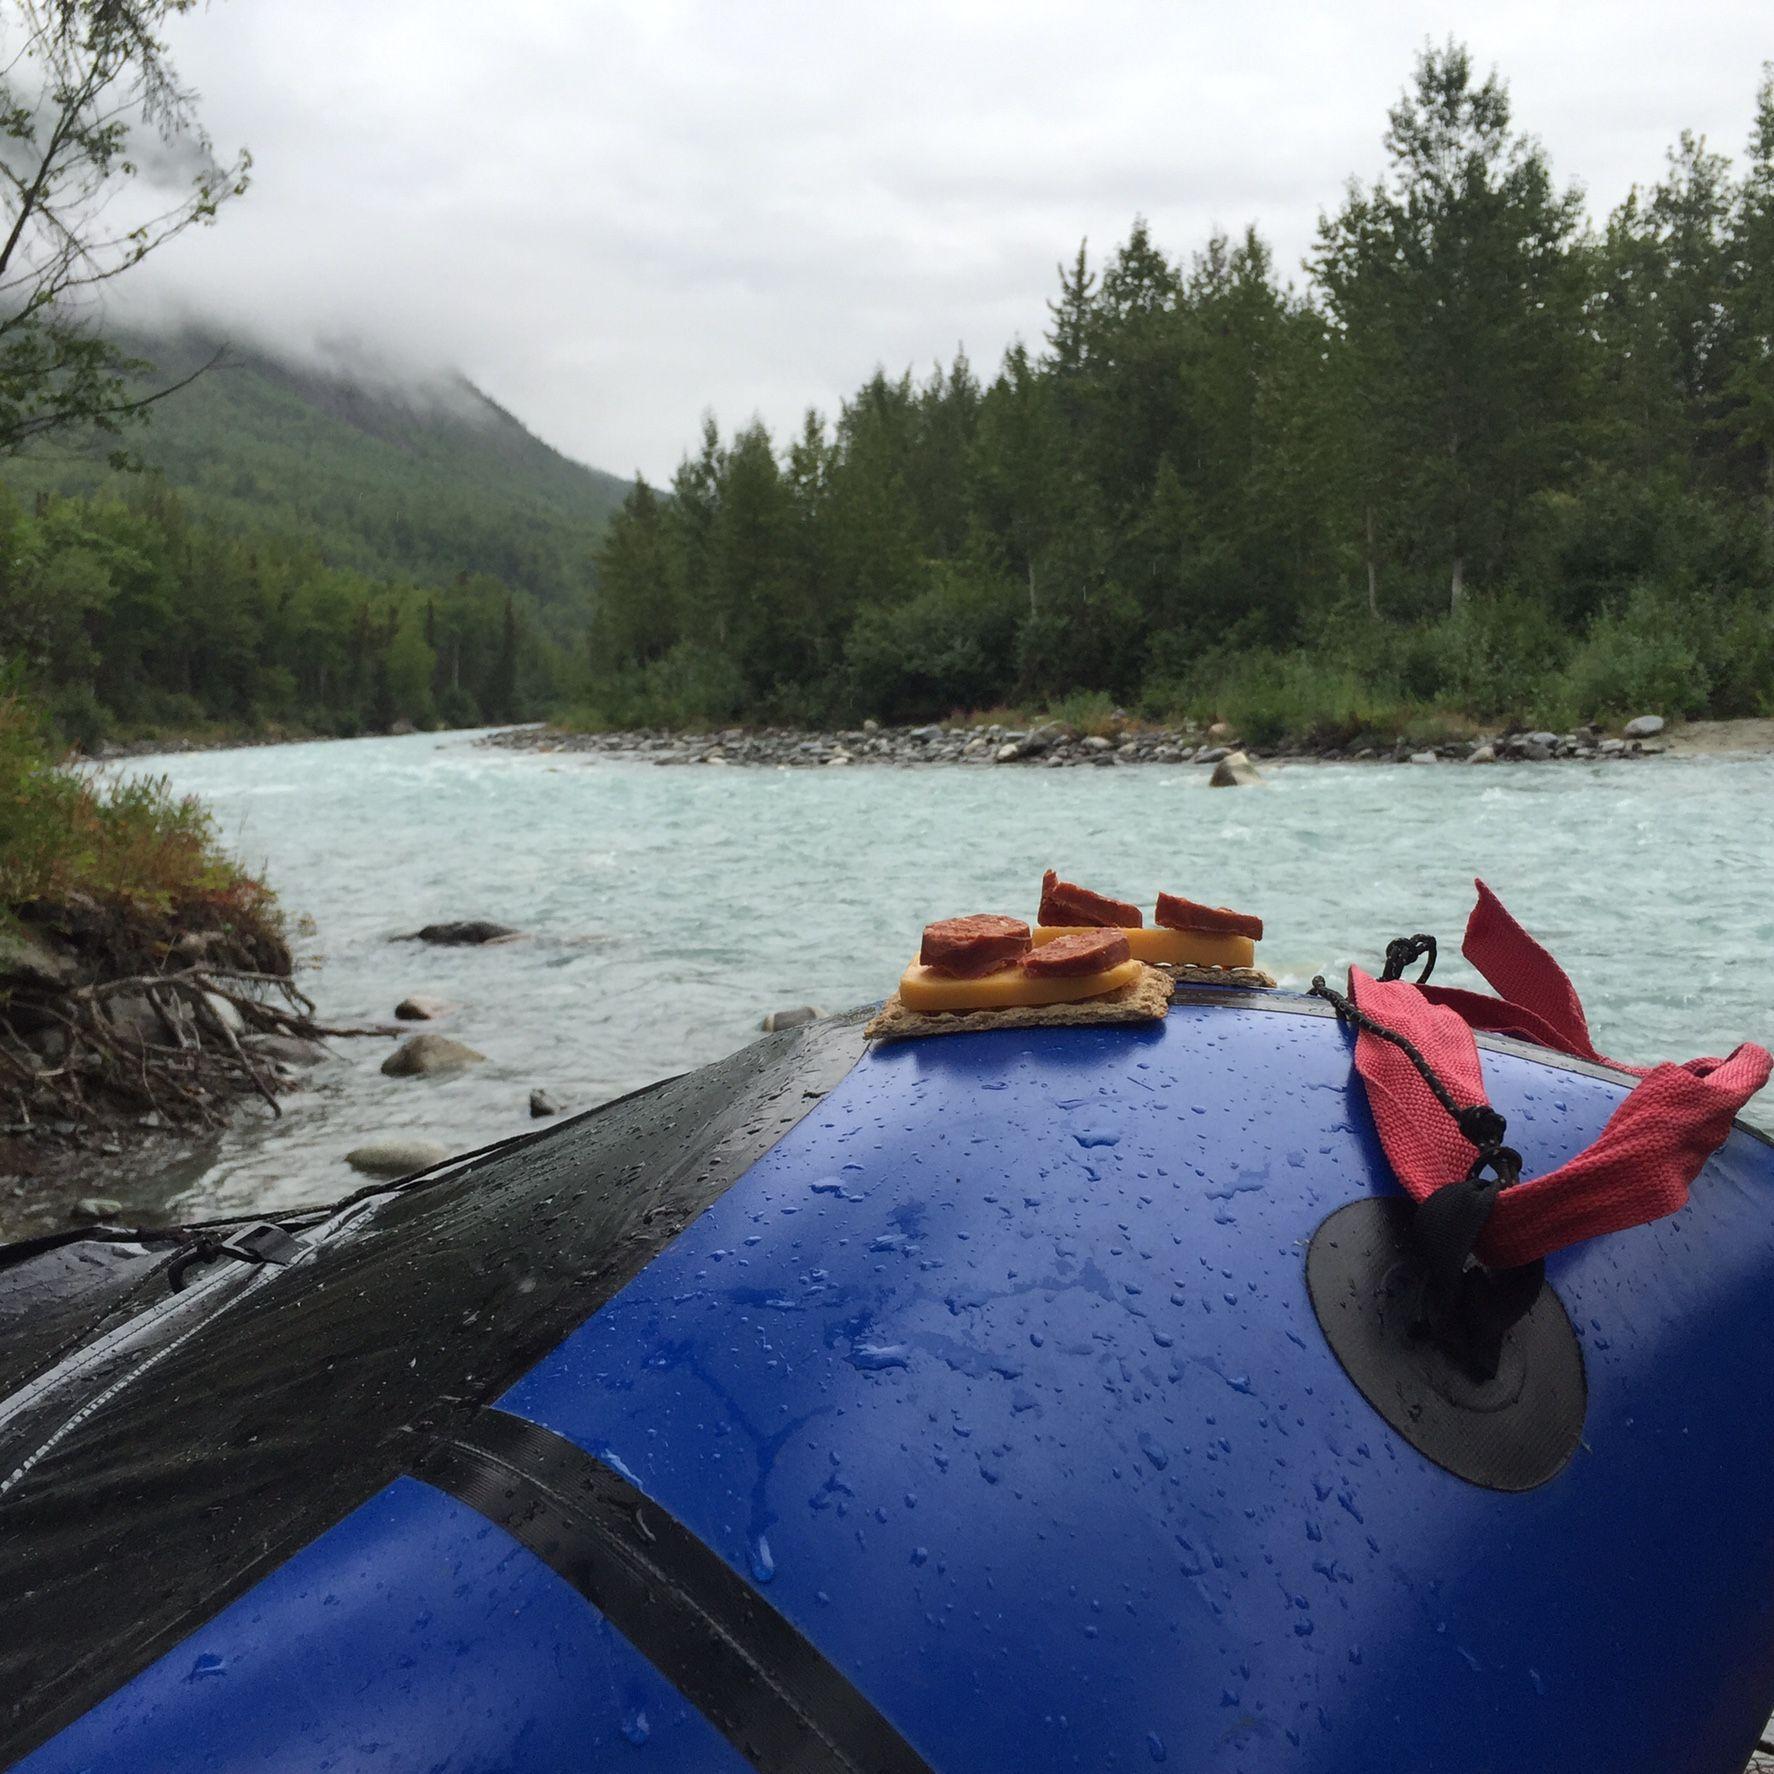 RyKrisp rafting along King's River, Alaska